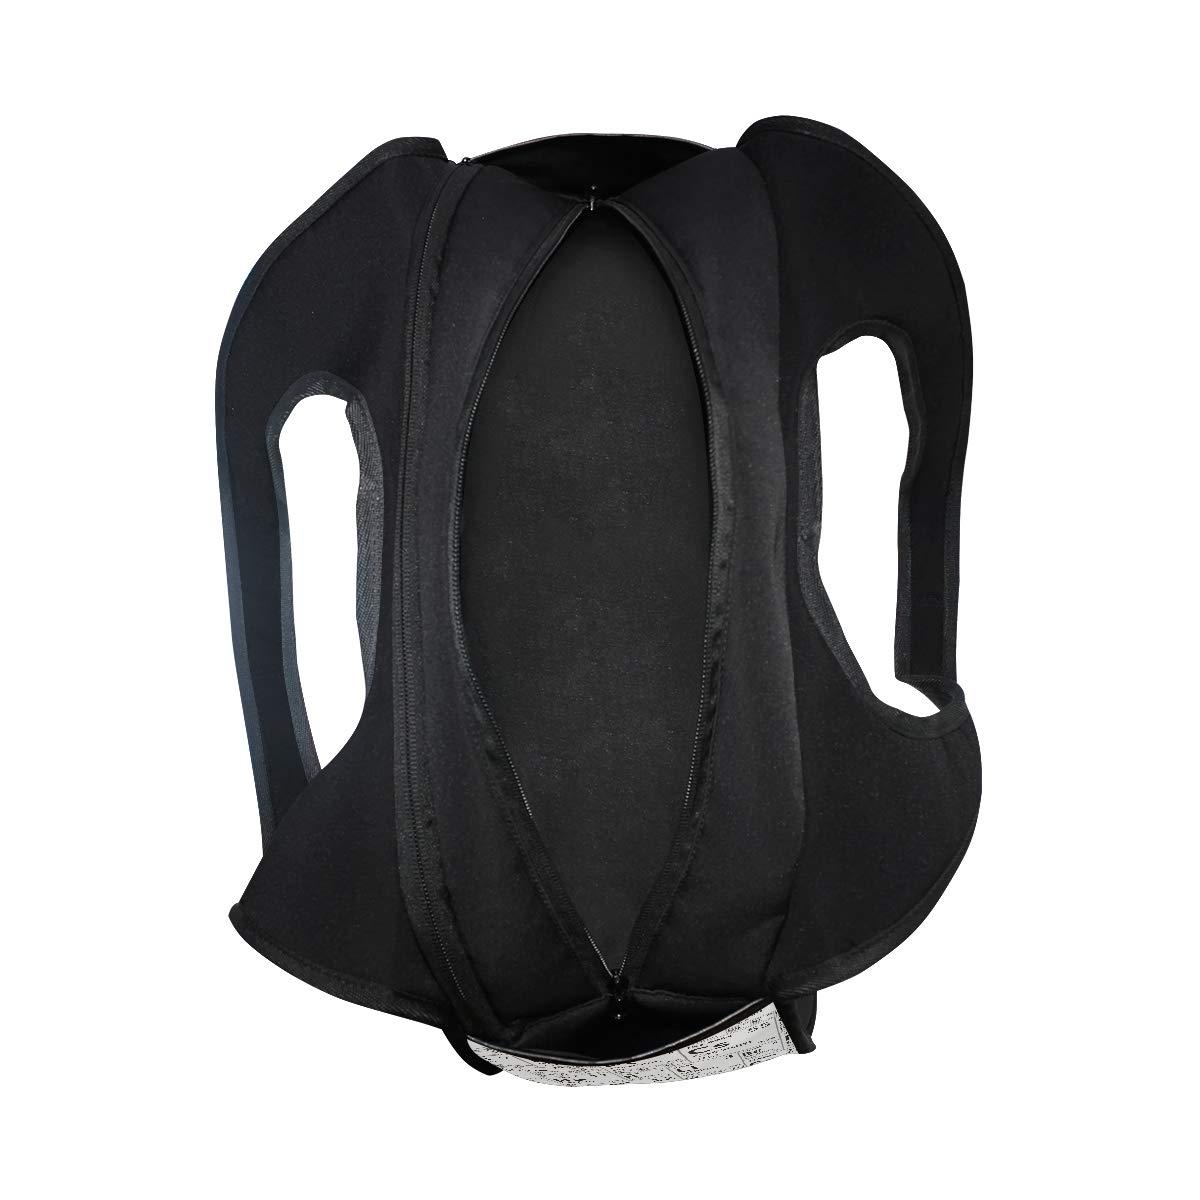 Unisex Travel Duffels Gym Bag Black White Periodic Table Of Element Canvas Weekender Bag Shoulder Bag Totes bags